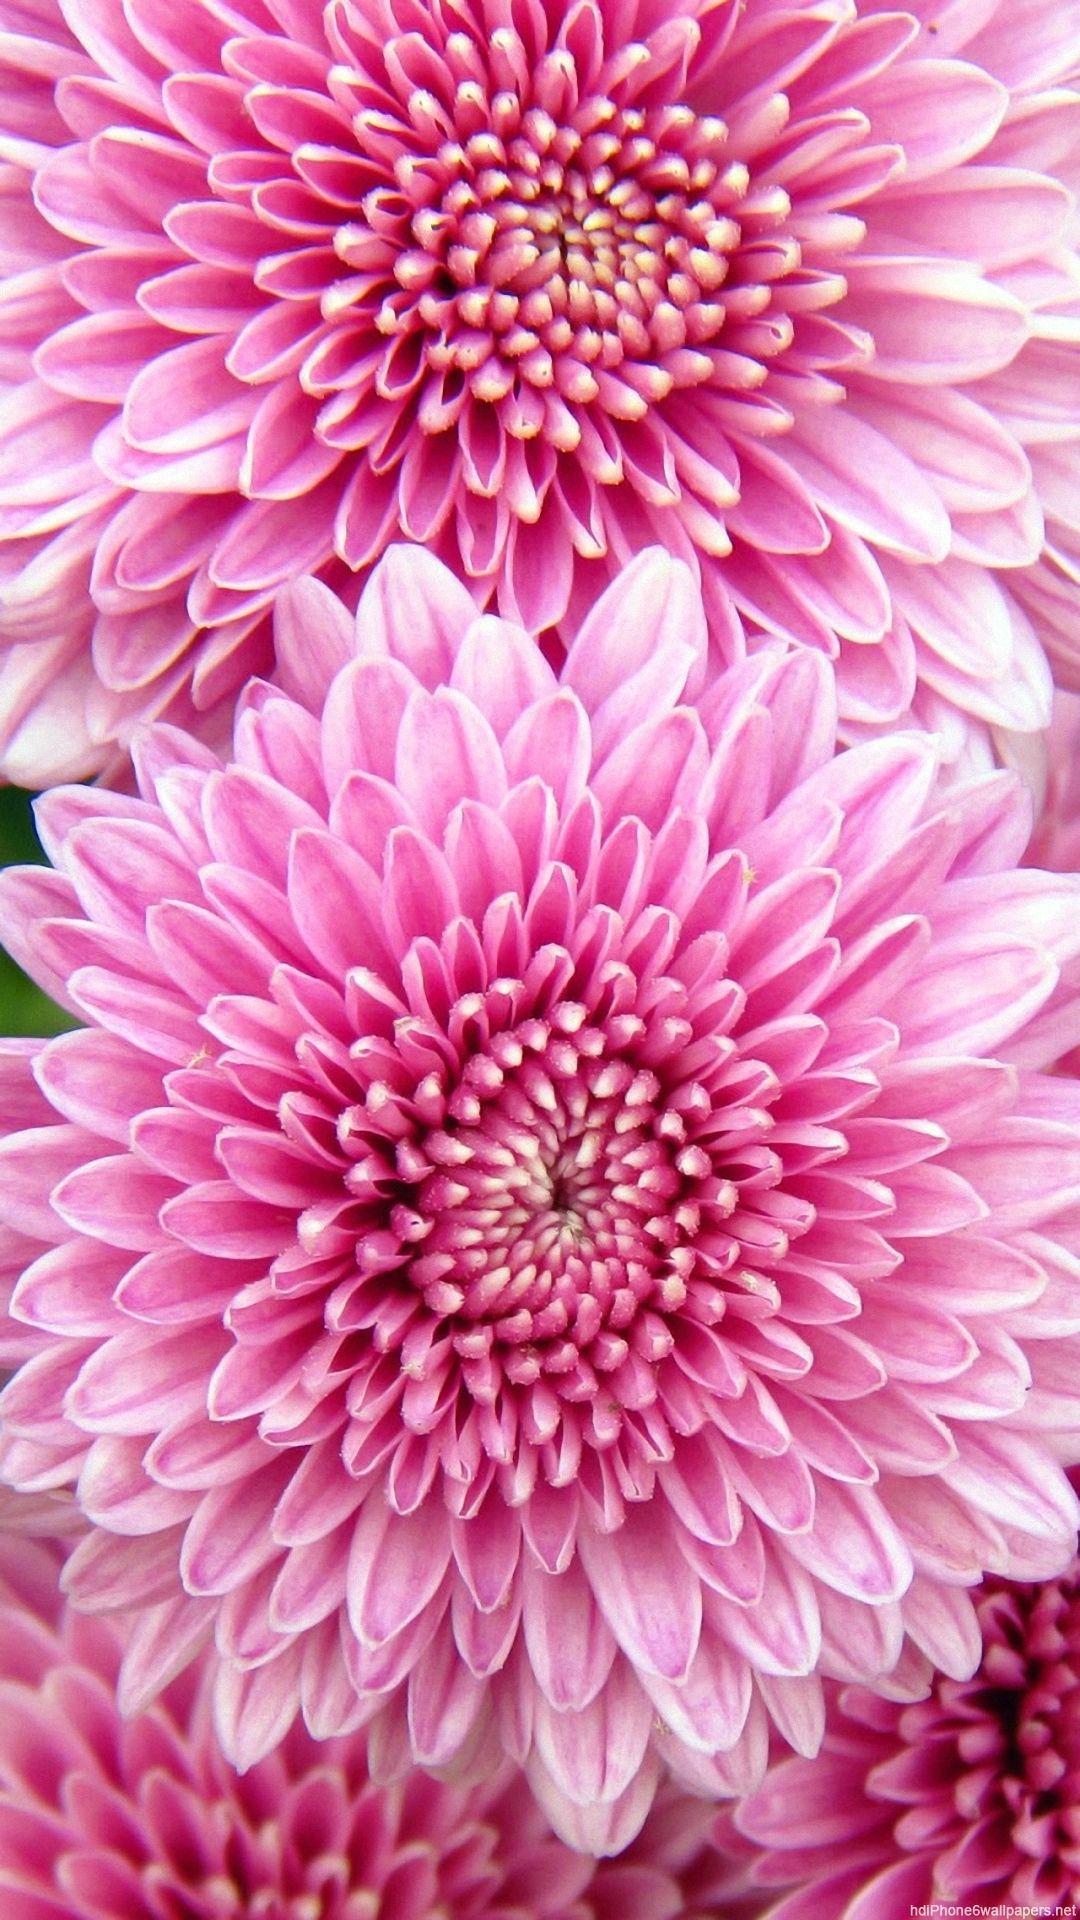 Beautiful pretty flowers iphone 6 wallpapers hd and 1080p 6 plus beautiful pretty flowers iphone 6 wallpapers hd and 1080p 6 plus voltagebd Gallery